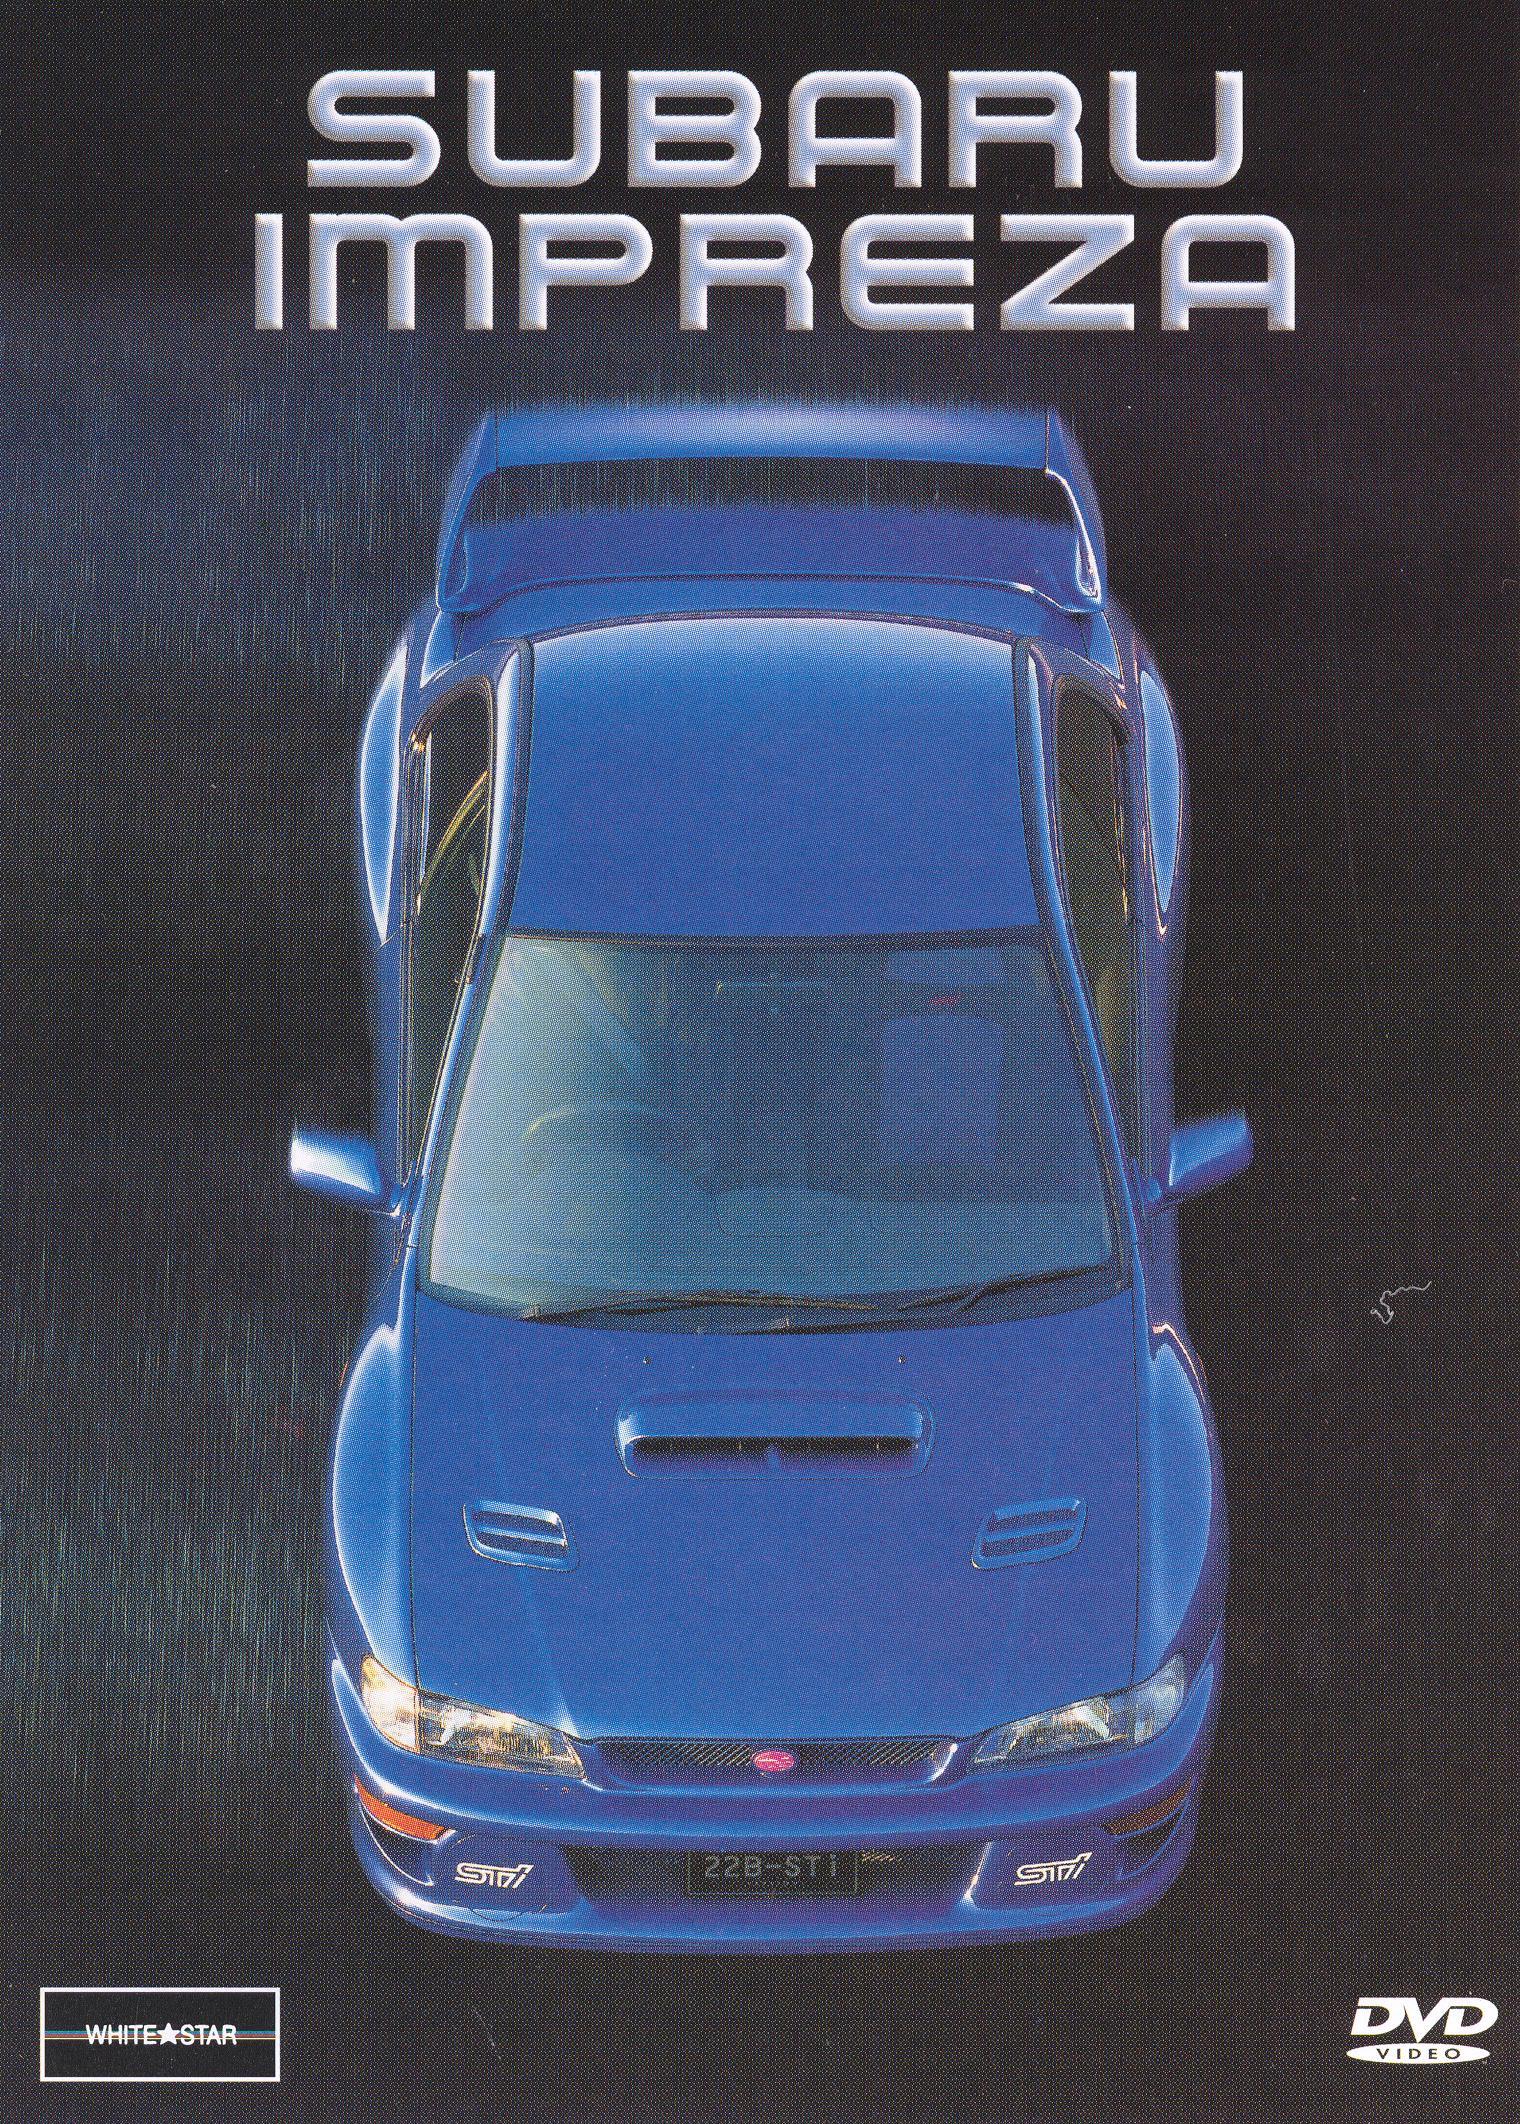 Subaru Impreza Story